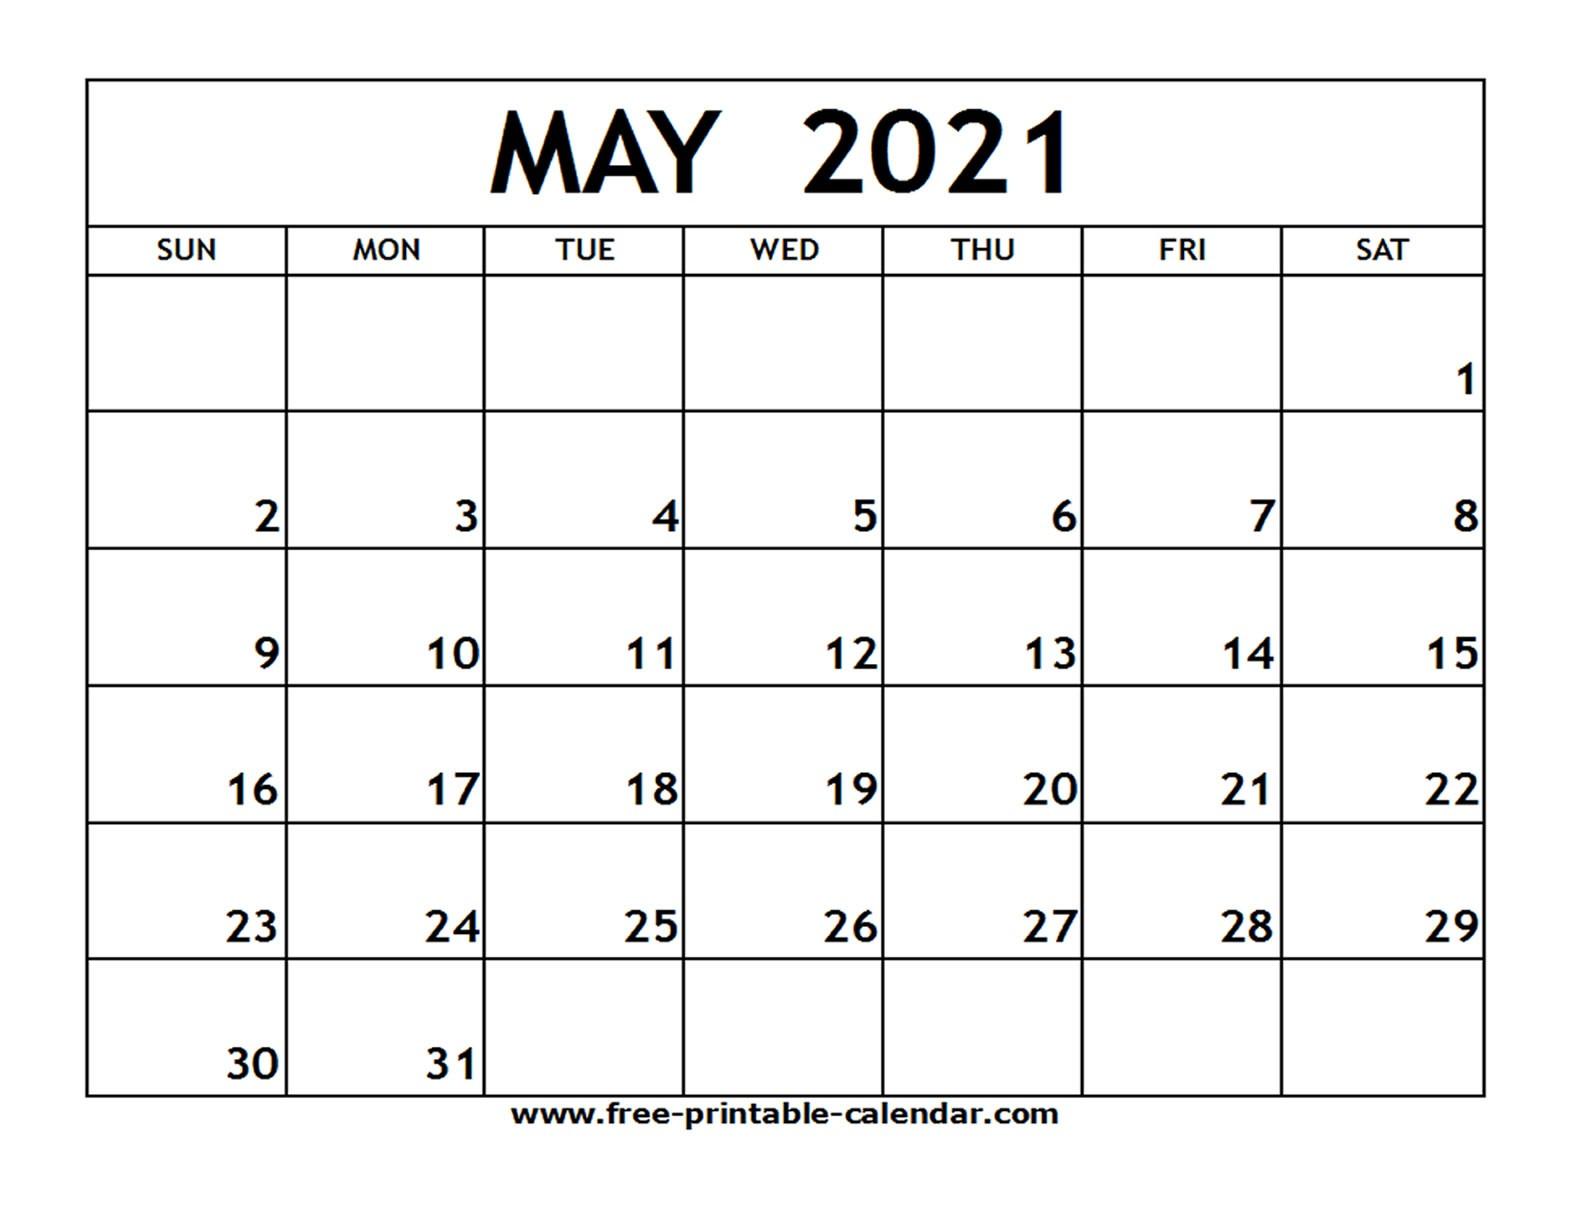 May 2021 Printable Calendar Free printable calendar